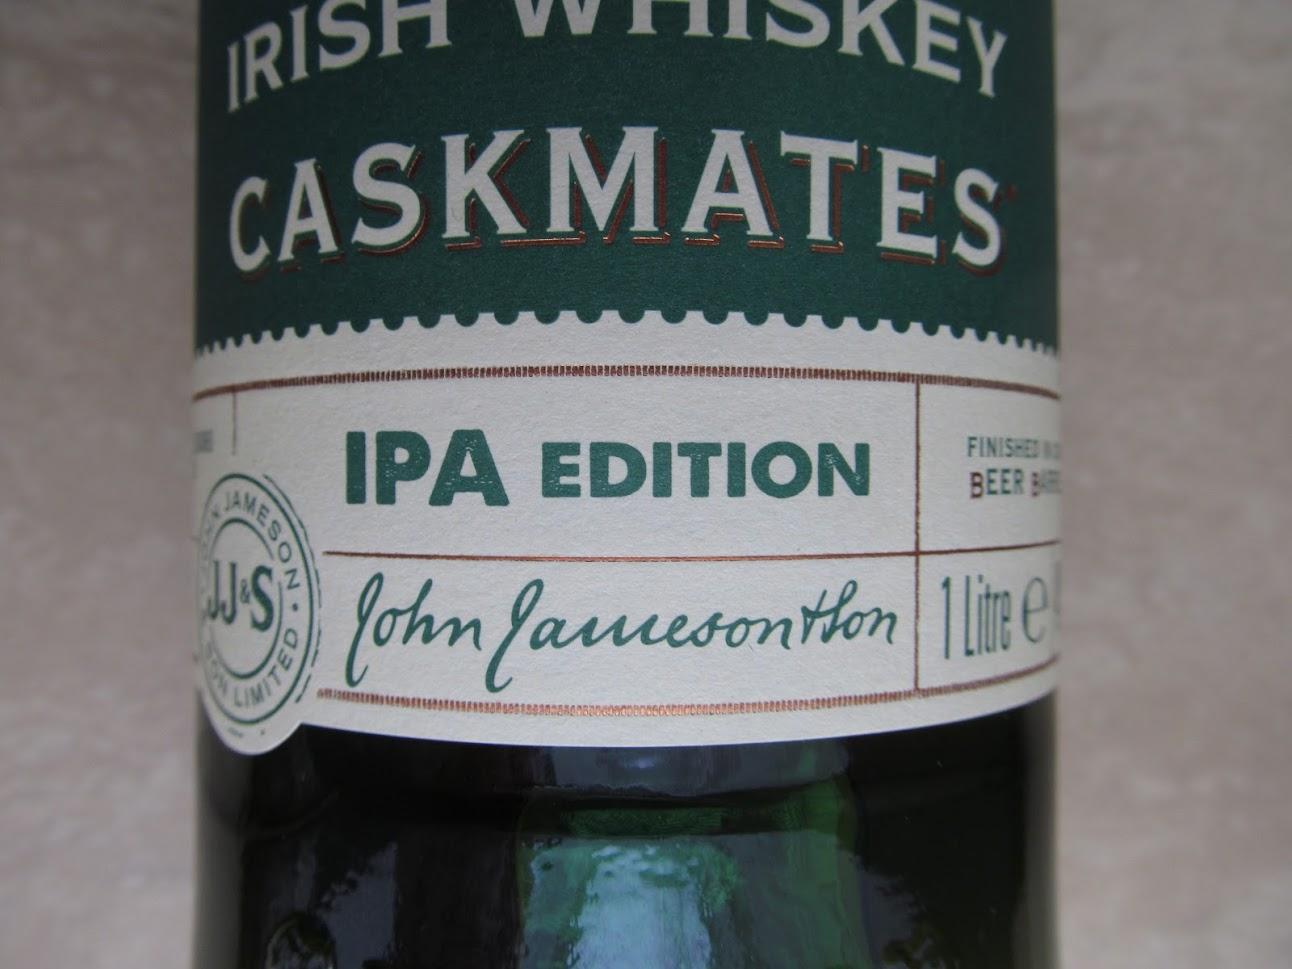 Jameson Caskmates - IPA